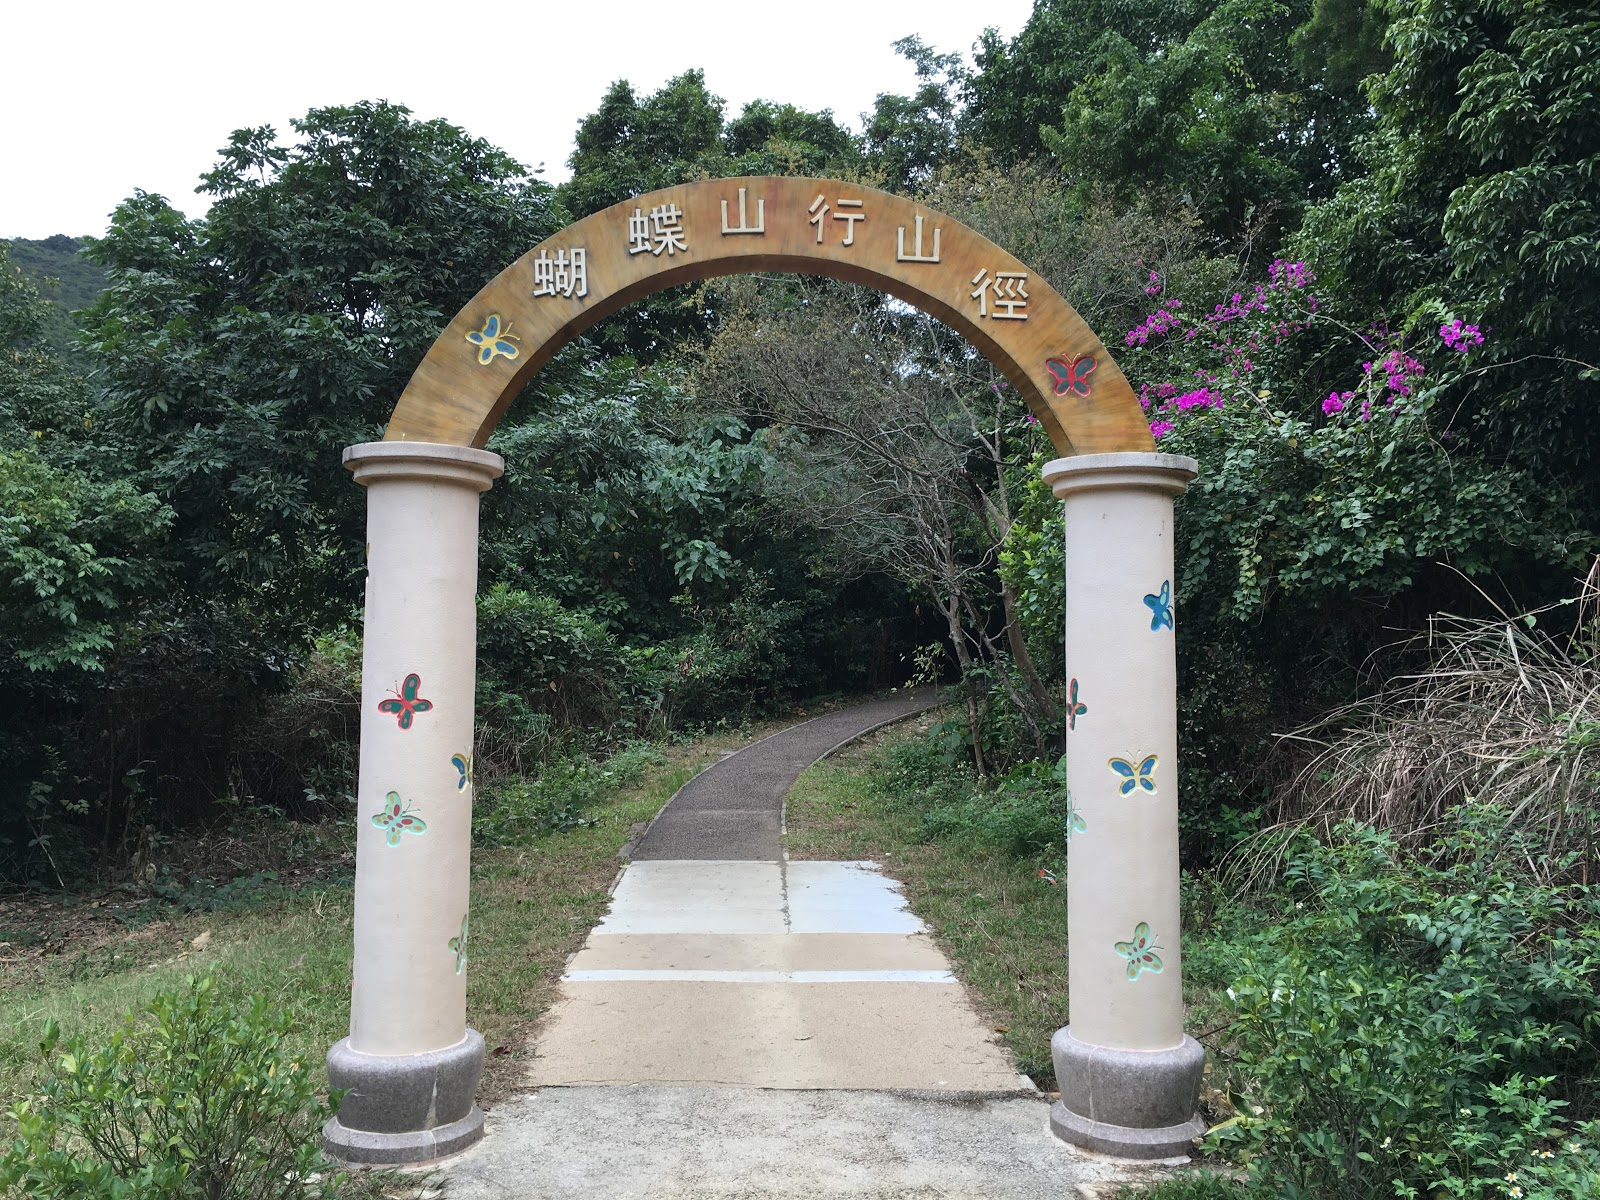 週末短遊新界群山 粉嶺蝴蝶山 - Wing Leung's Outdoor Blog 2.0